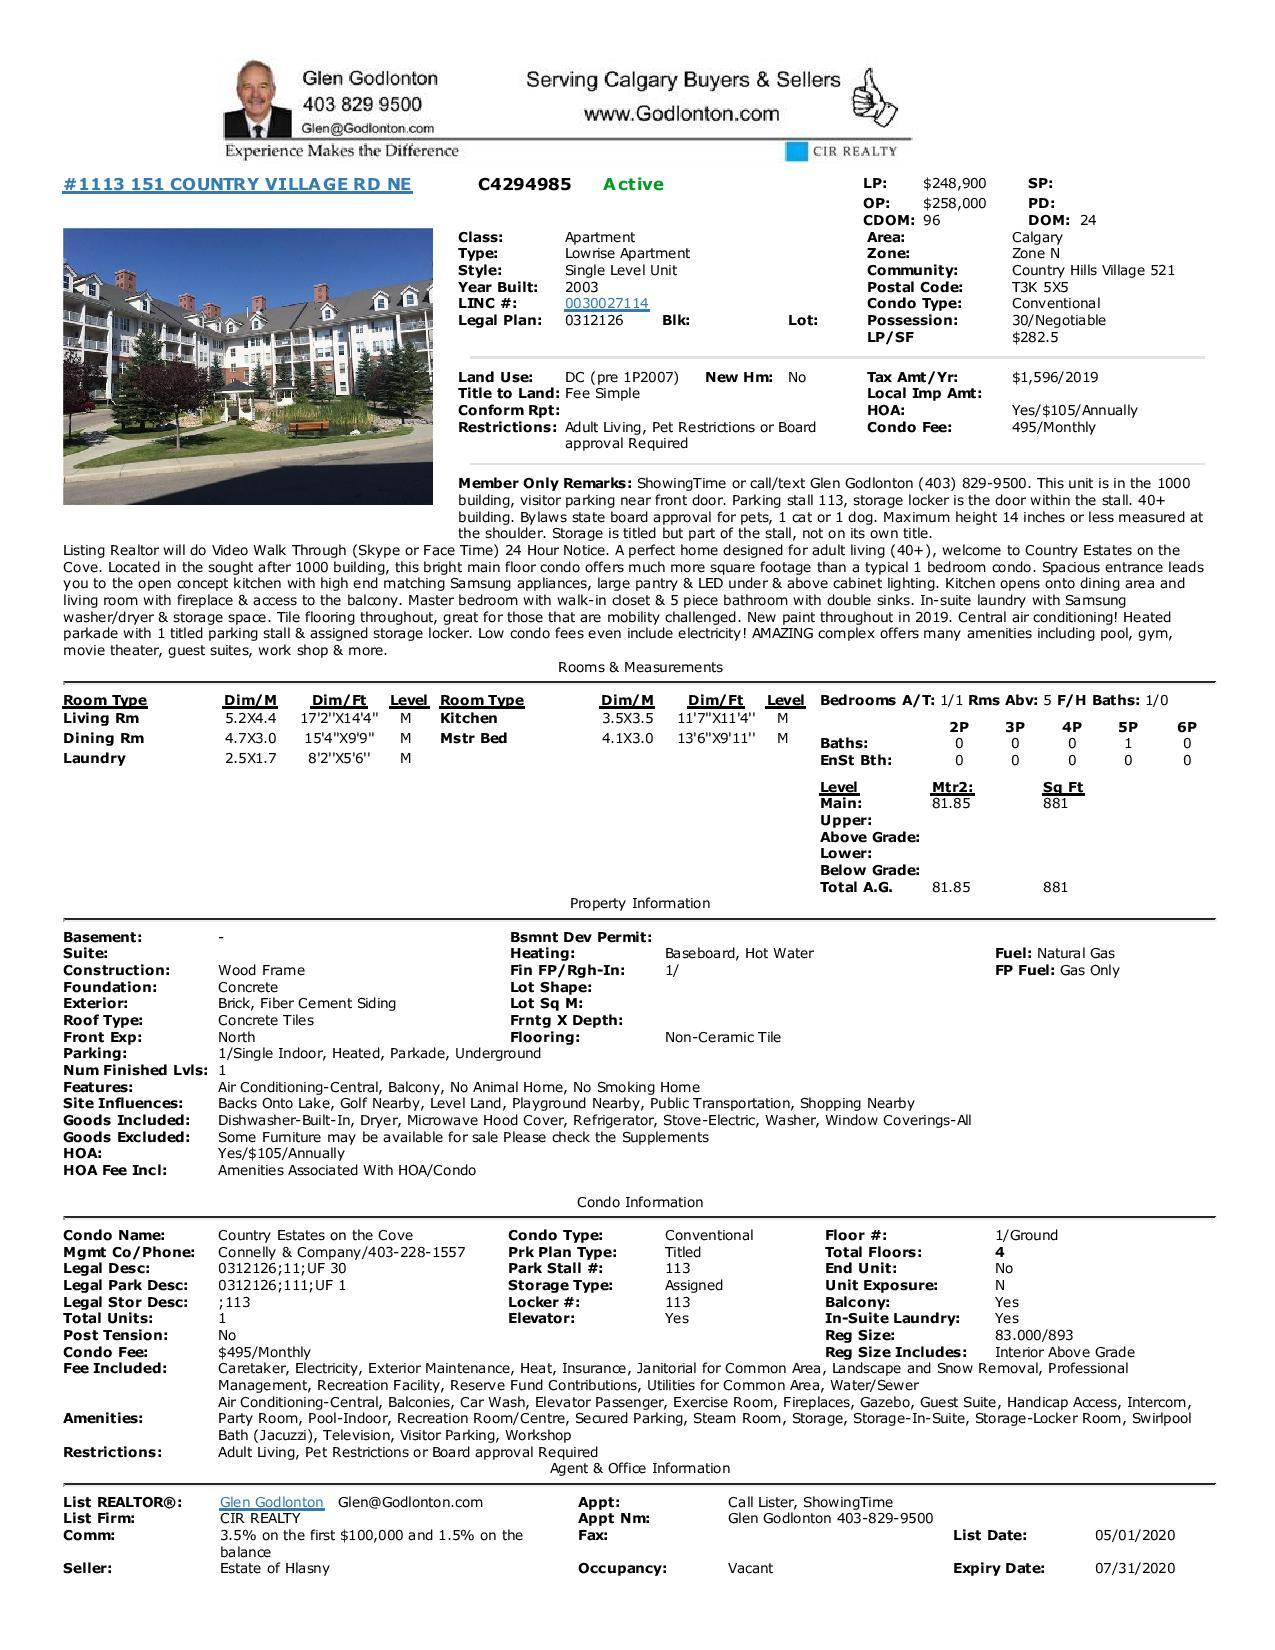 Active MLS 1012 16A St $414,900